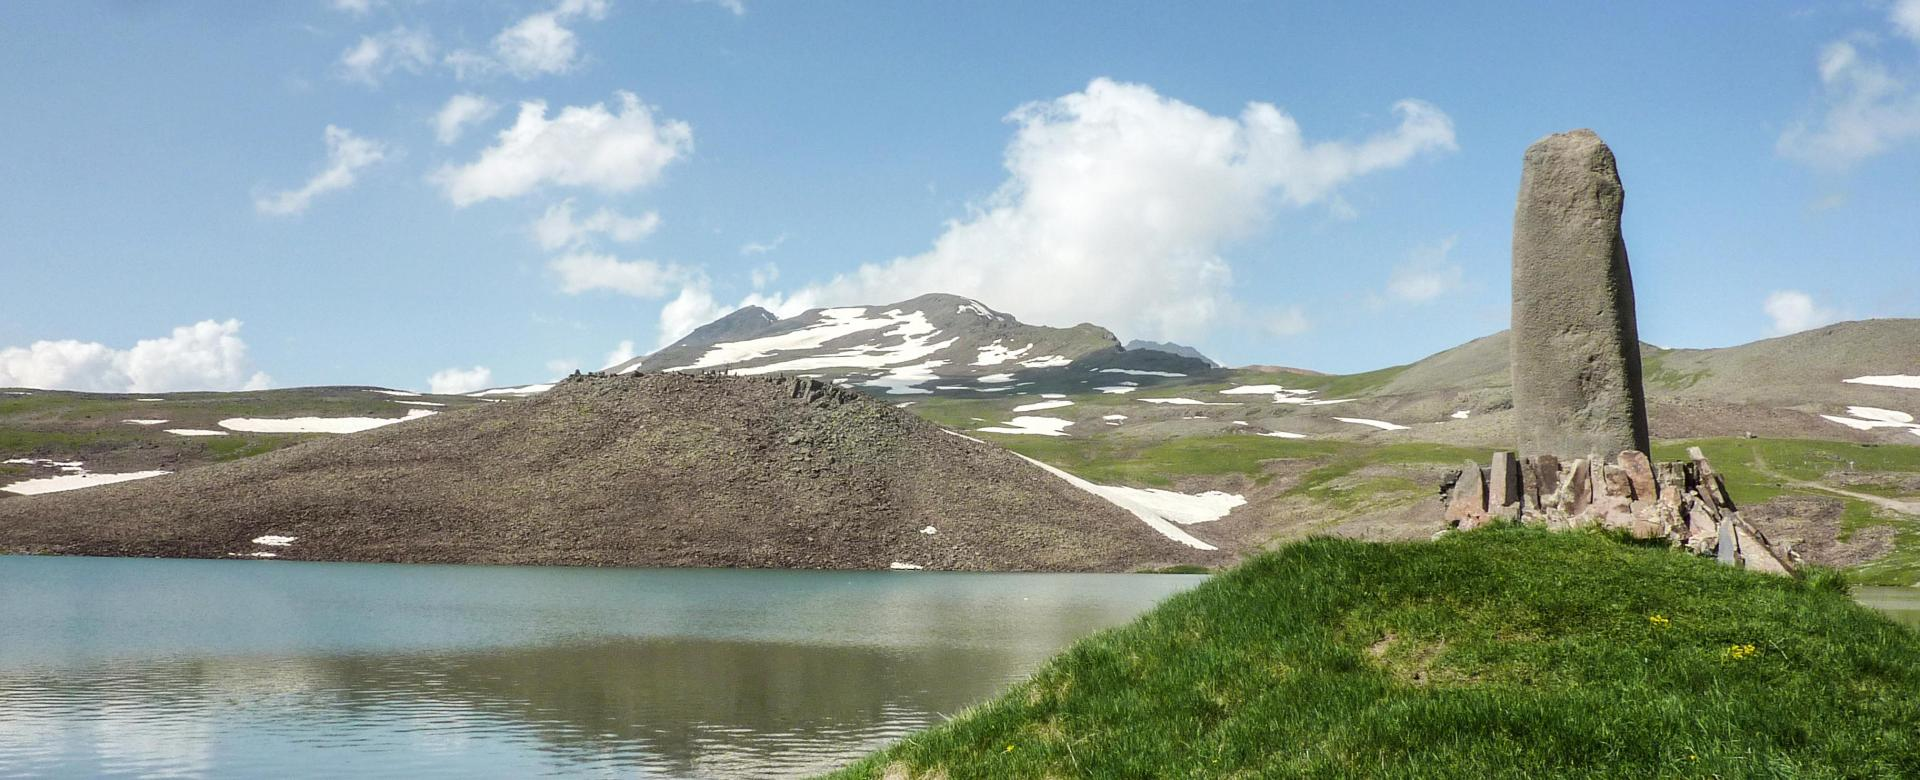 Trekking Arménie : L'arménie et ses merveilles